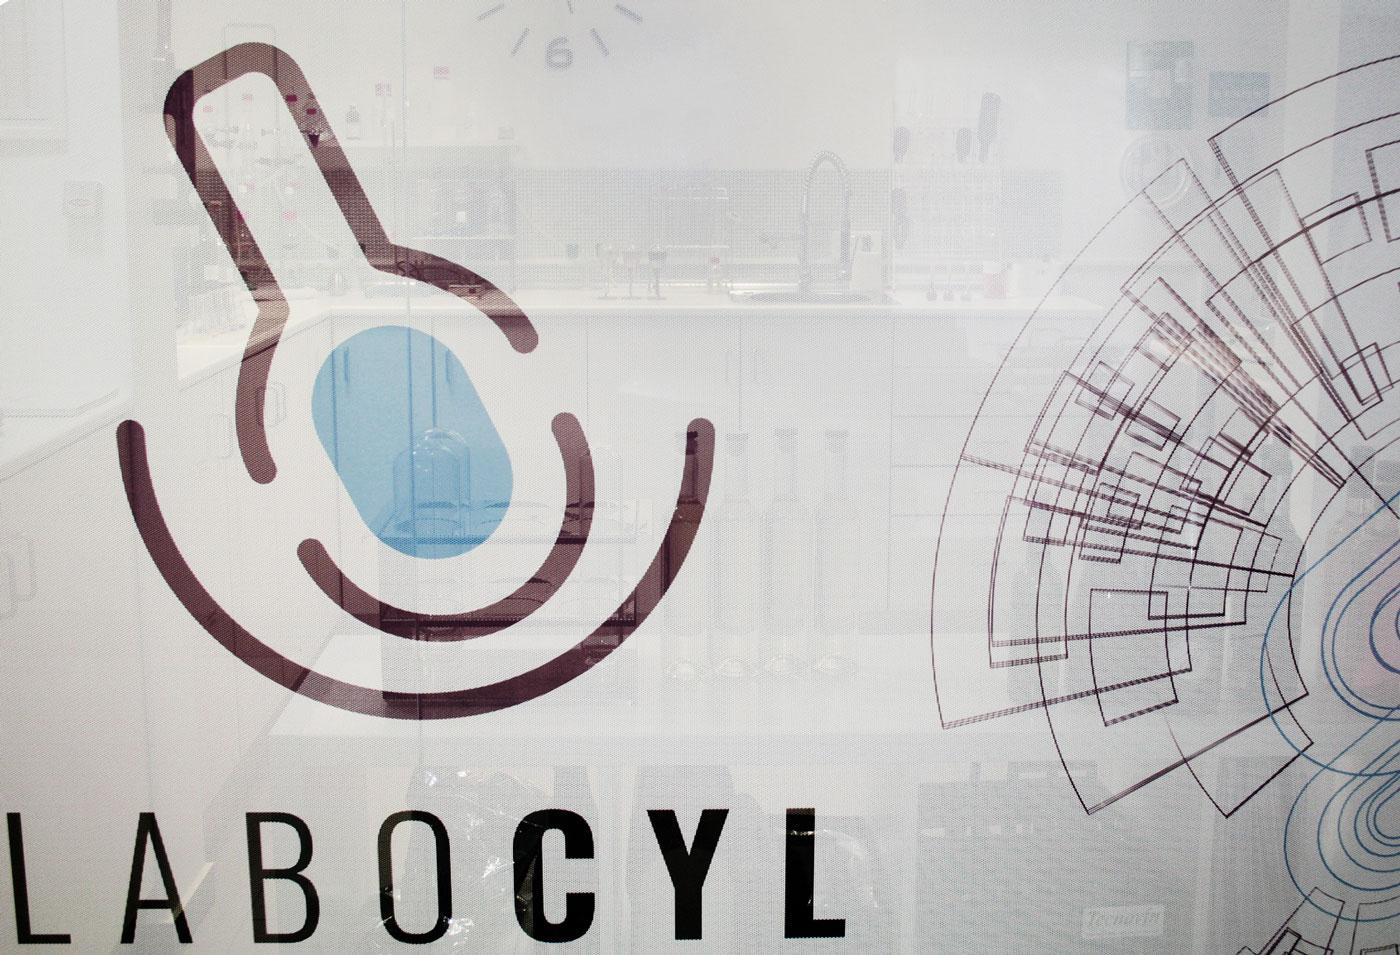 Labocyl